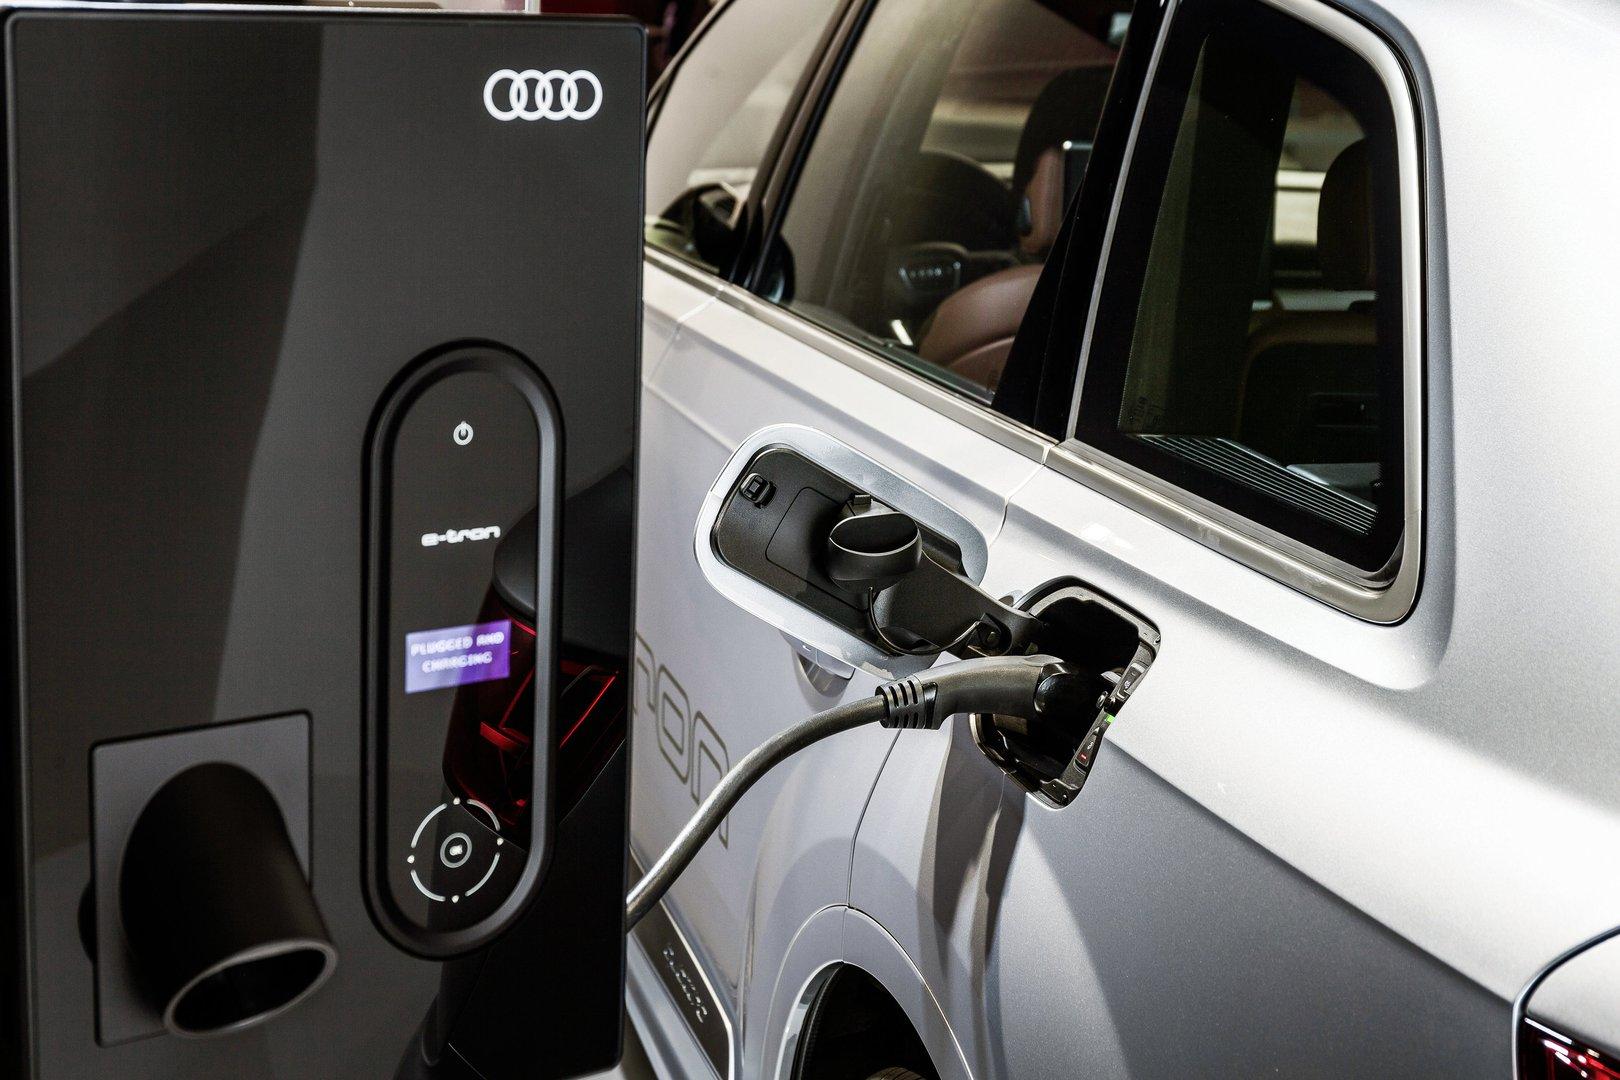 Audi Q7 e-tron 3.0 TDI quattro - EV catalogue - Plugin-magazine.com